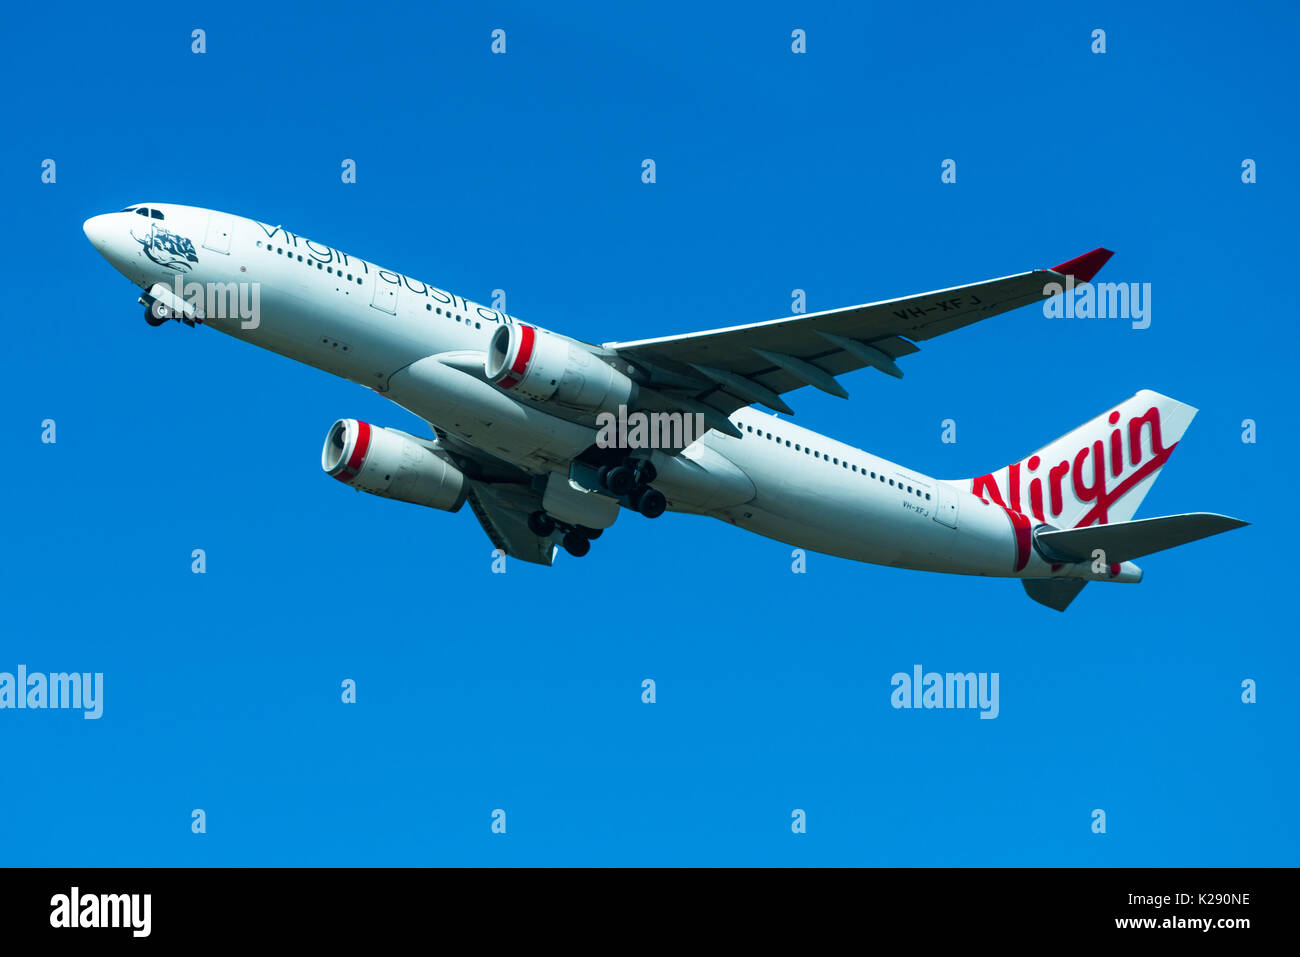 Jungfrau Australien PKW Flugzeug Vom Internationalen Flughafen Sydney, New South Wales, Australien. Stockbild